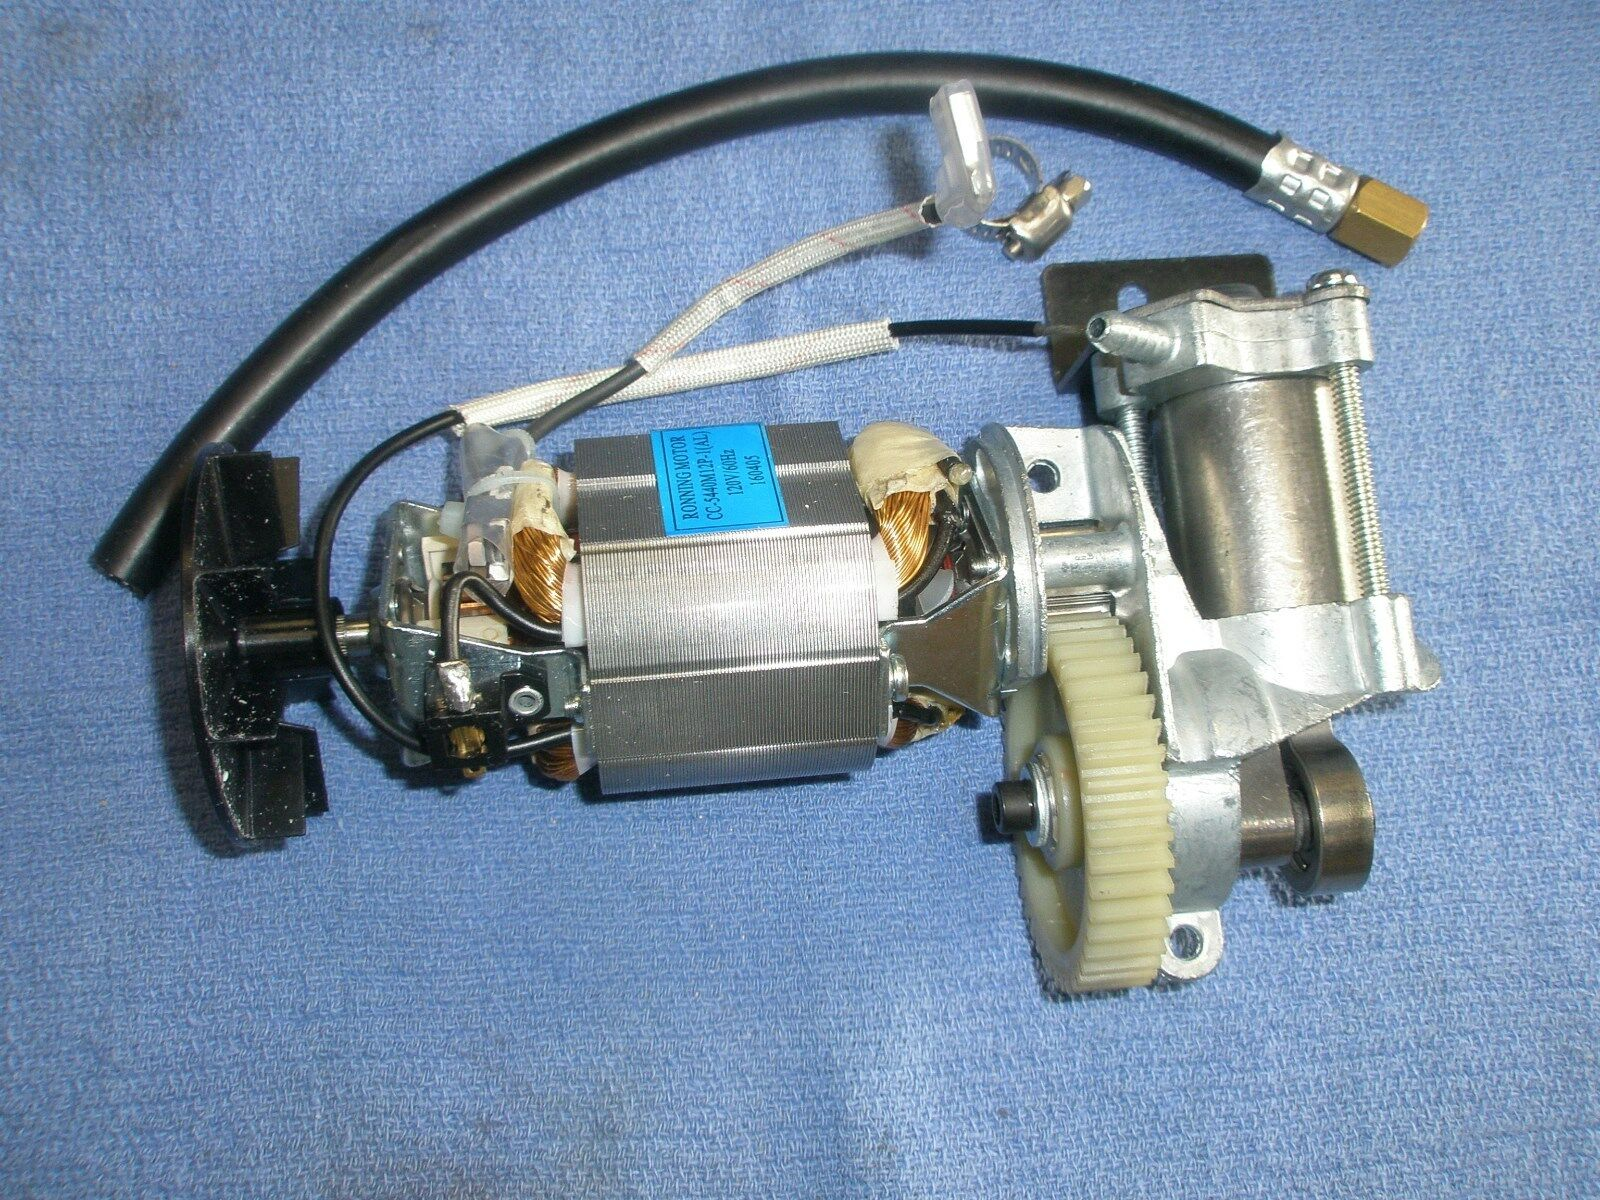 Fp209039av campbell hausfeld air compressor pump motor for Air compressor pump and motor